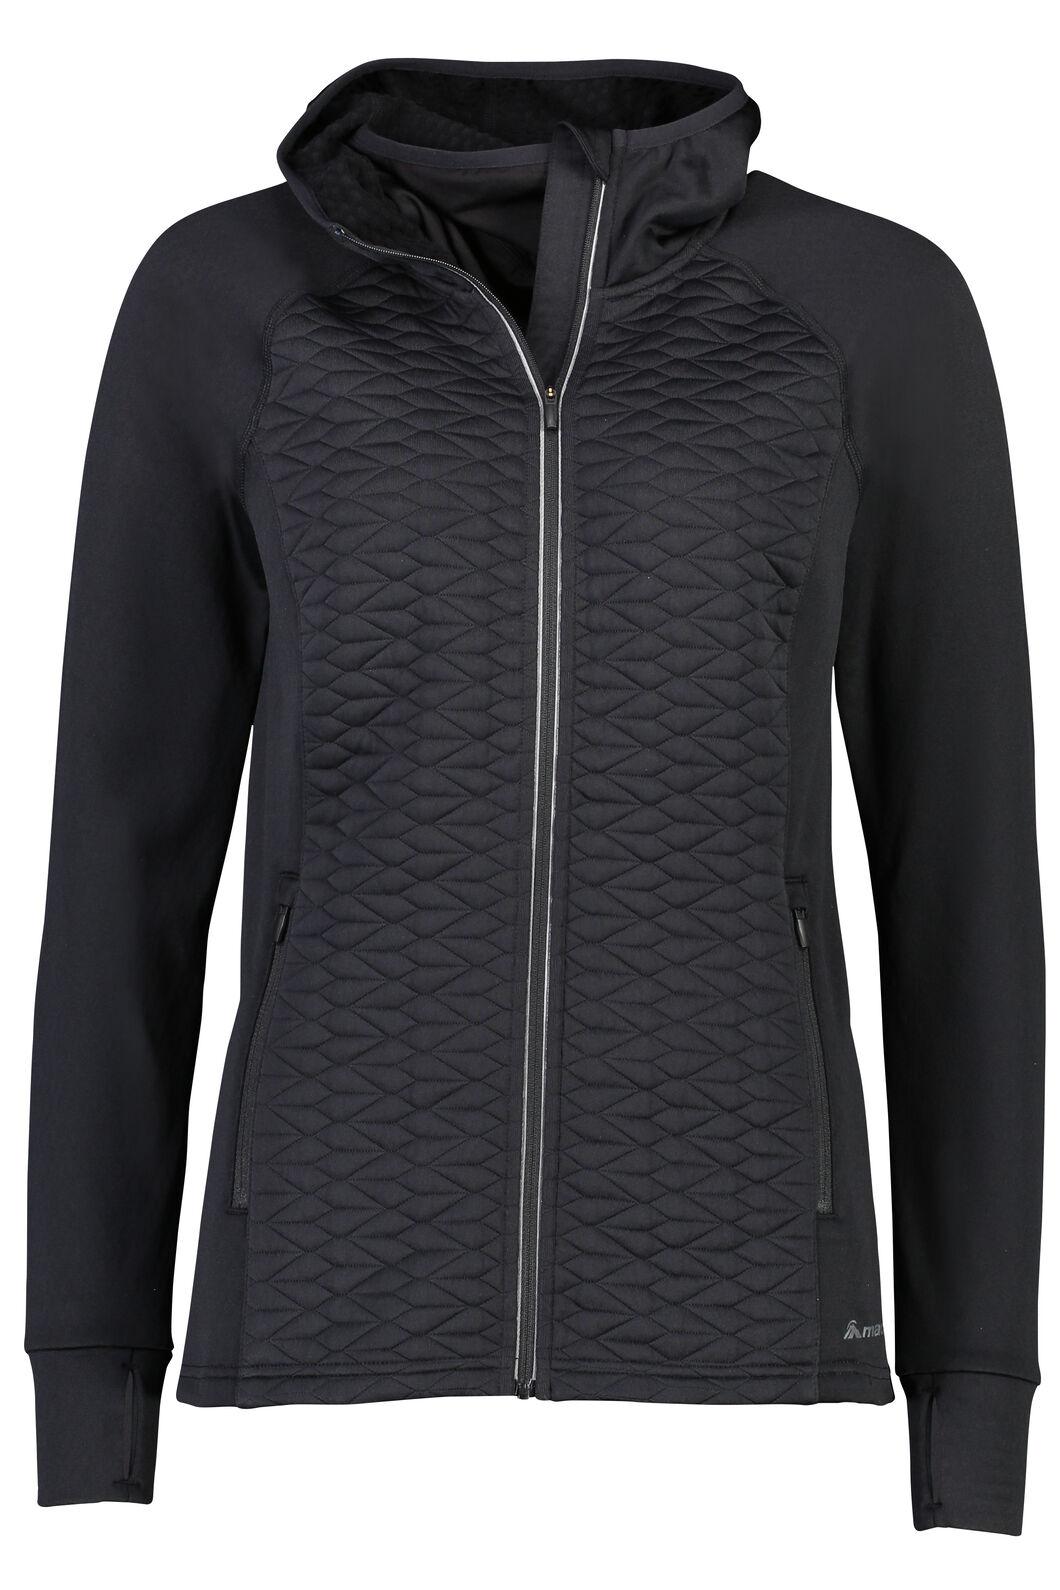 Macpac Blitz Jacket - Women's, Black, hi-res